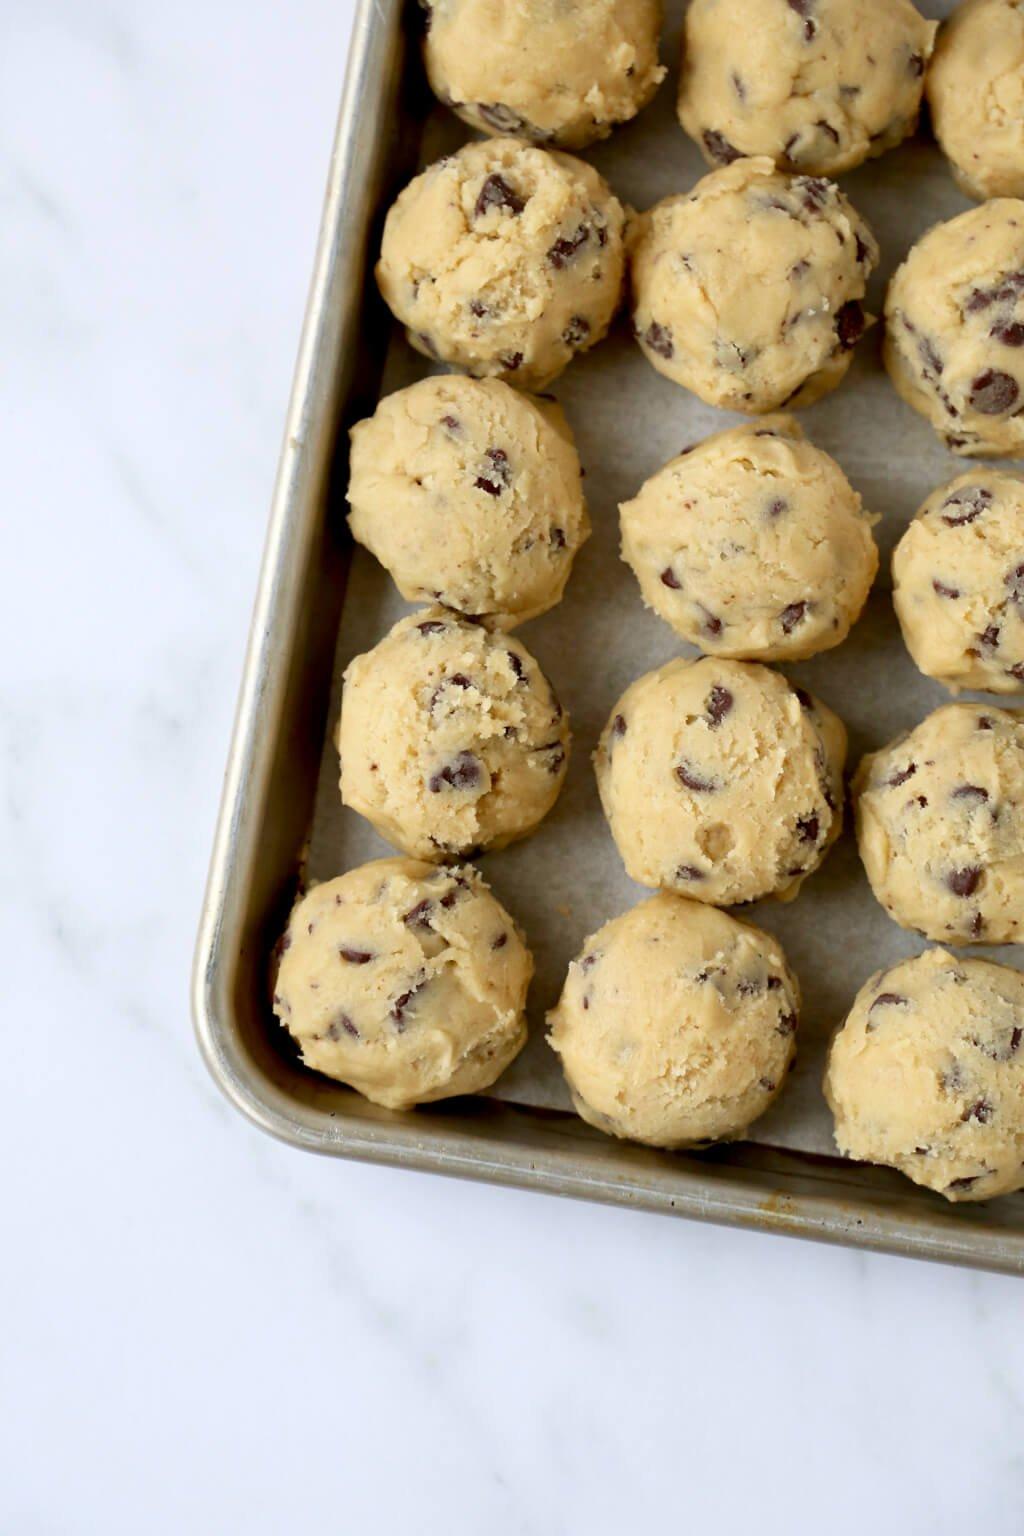 raw cookie dough balls on a baking sheet